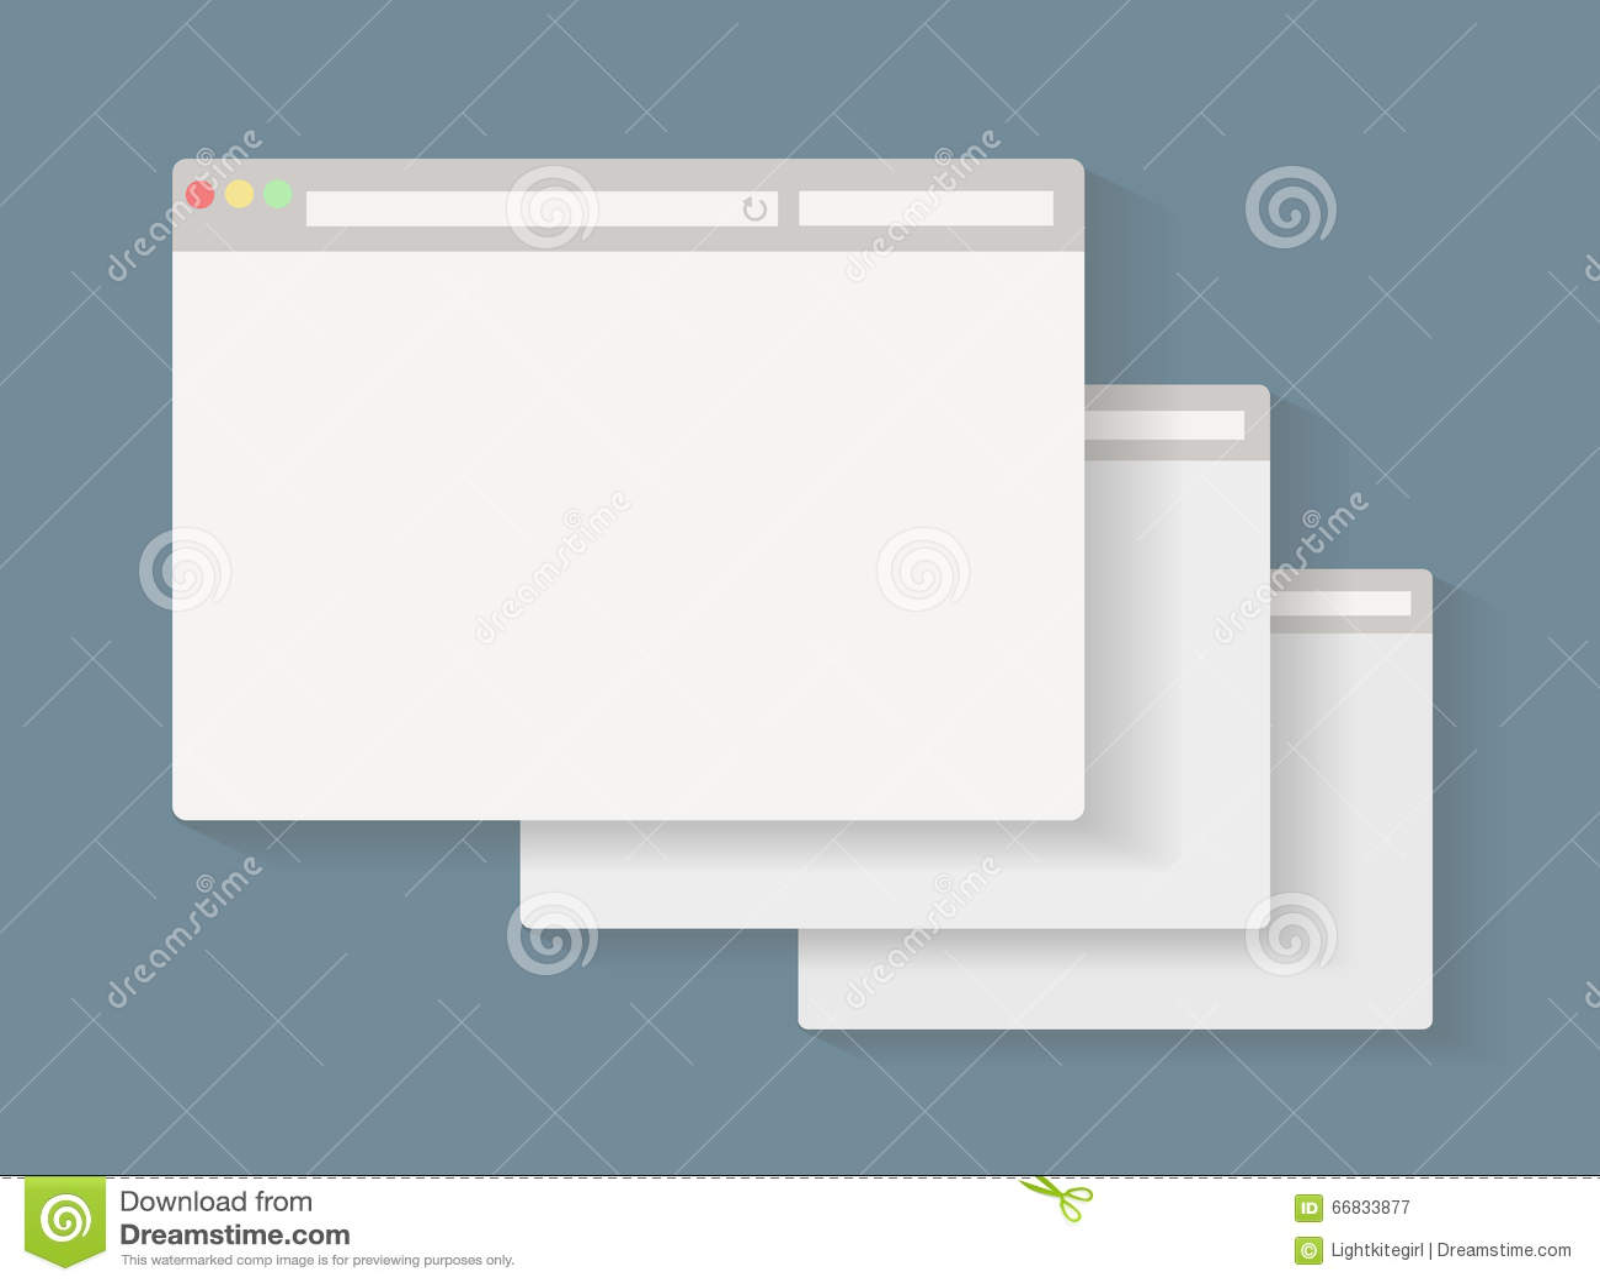 Simple set of browser window.